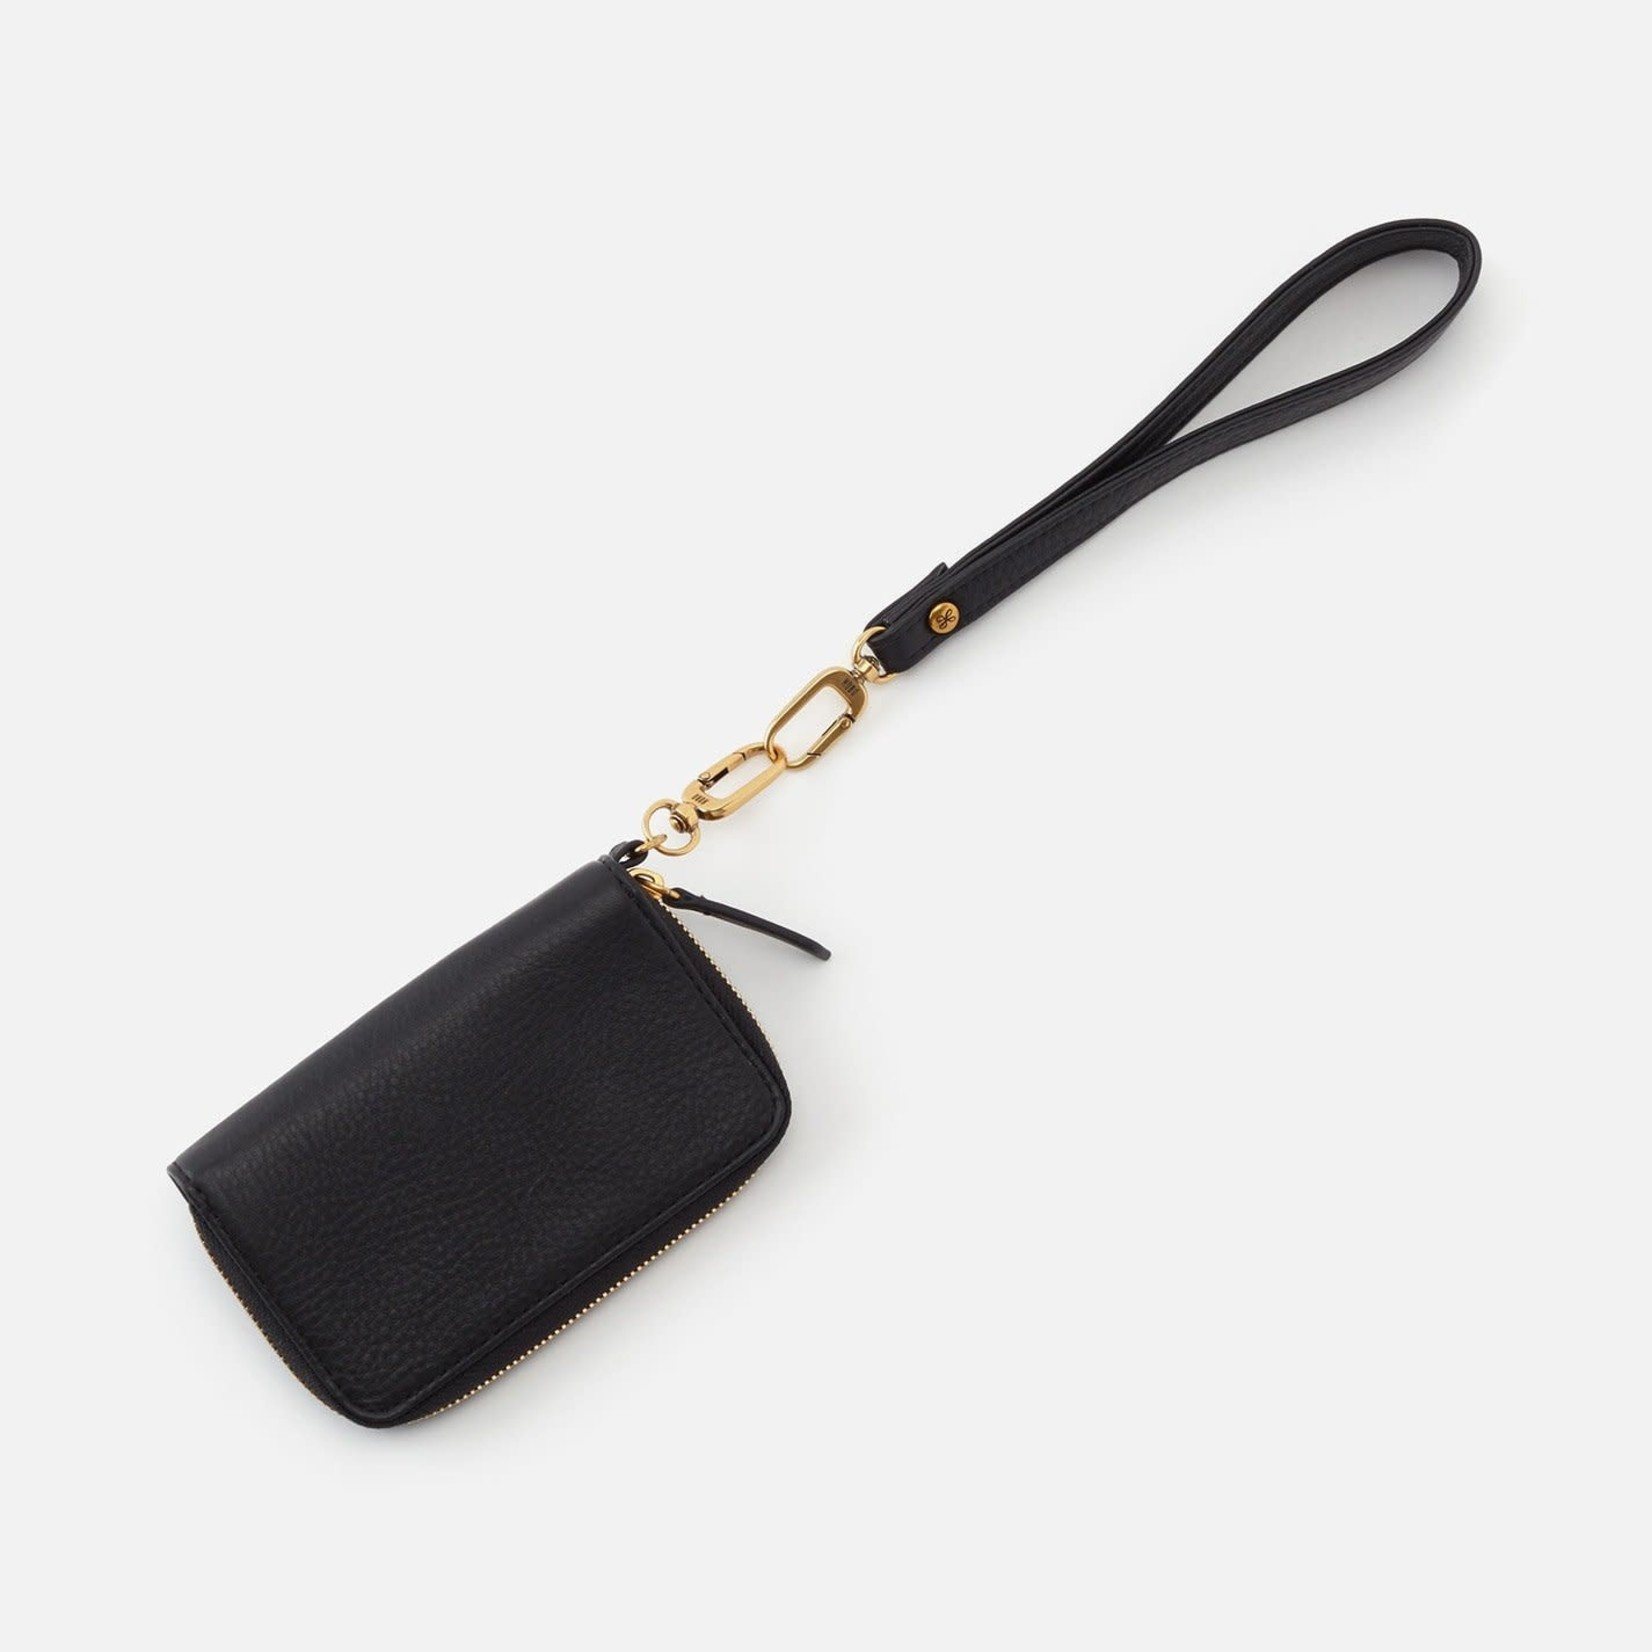 HOBO Grip Black Soft Leather Wristlet Strap